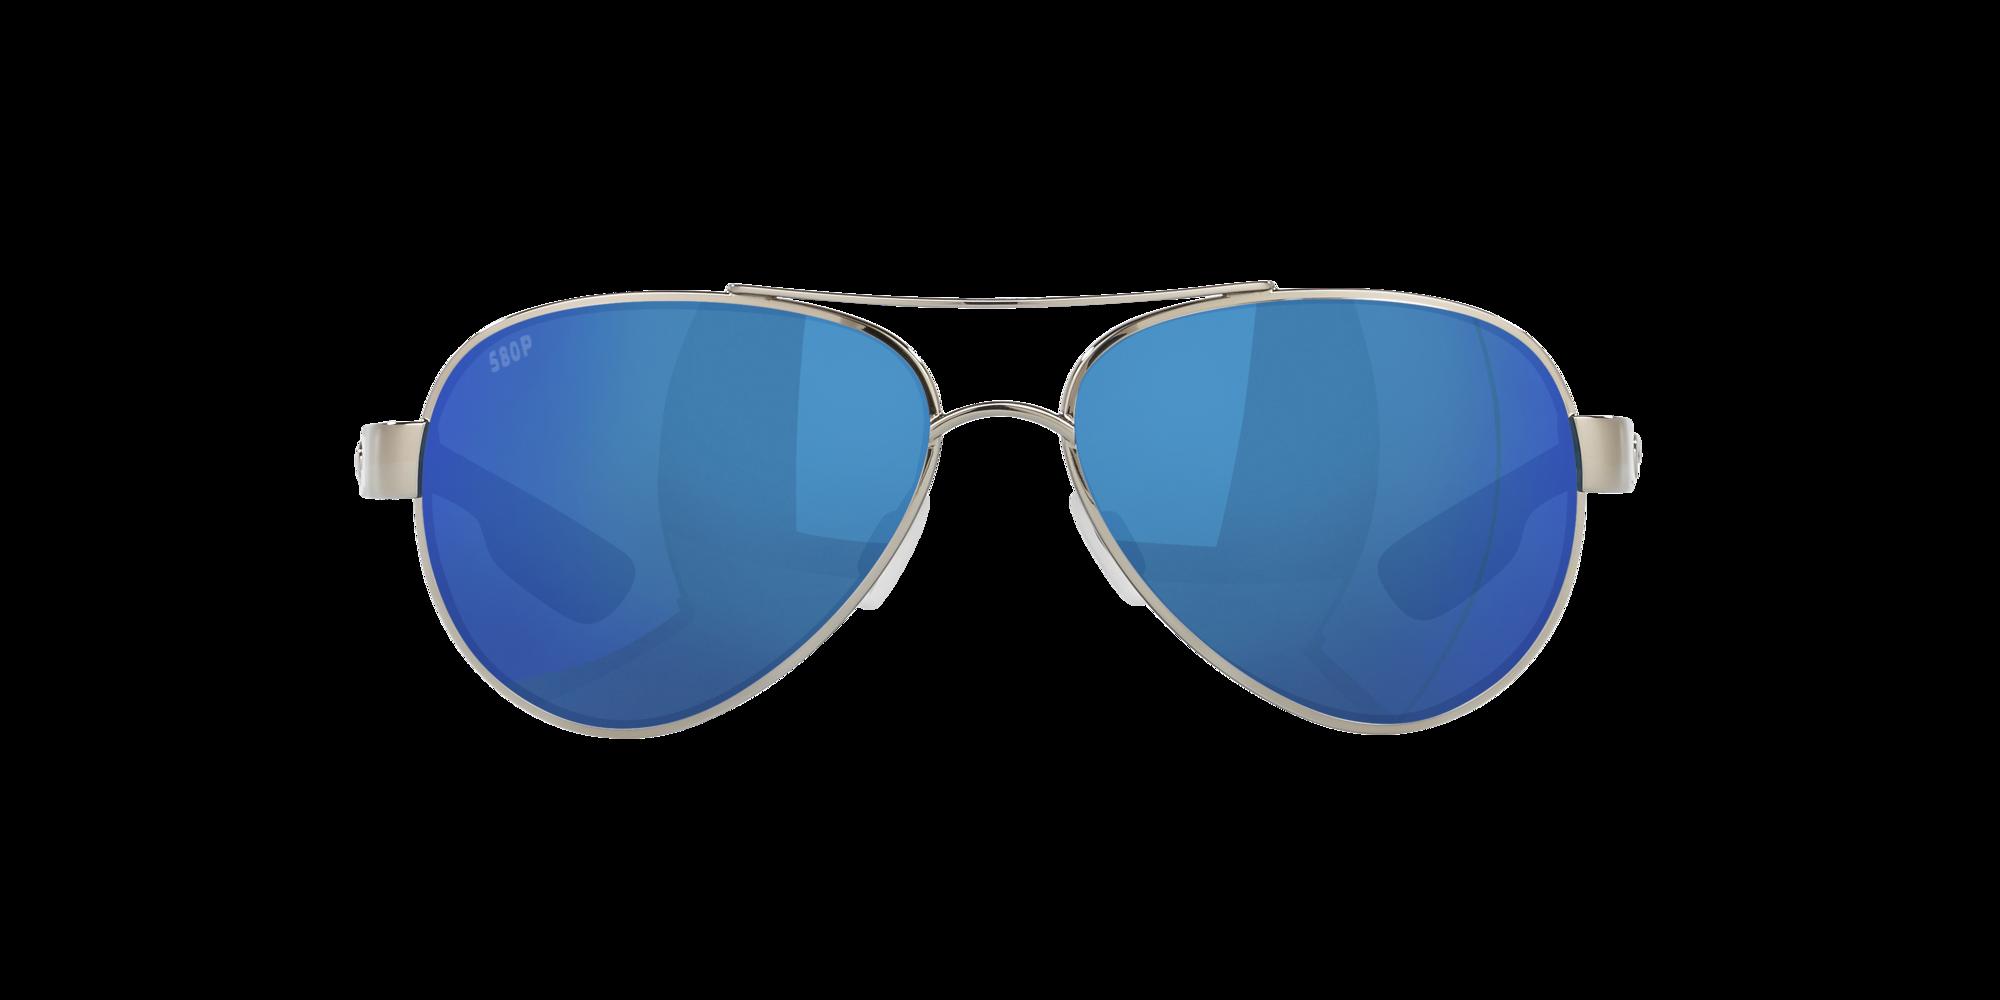 Image for Loreto 59 from LensCrafters | Glasses, Prescription Glasses Online, Eyewear